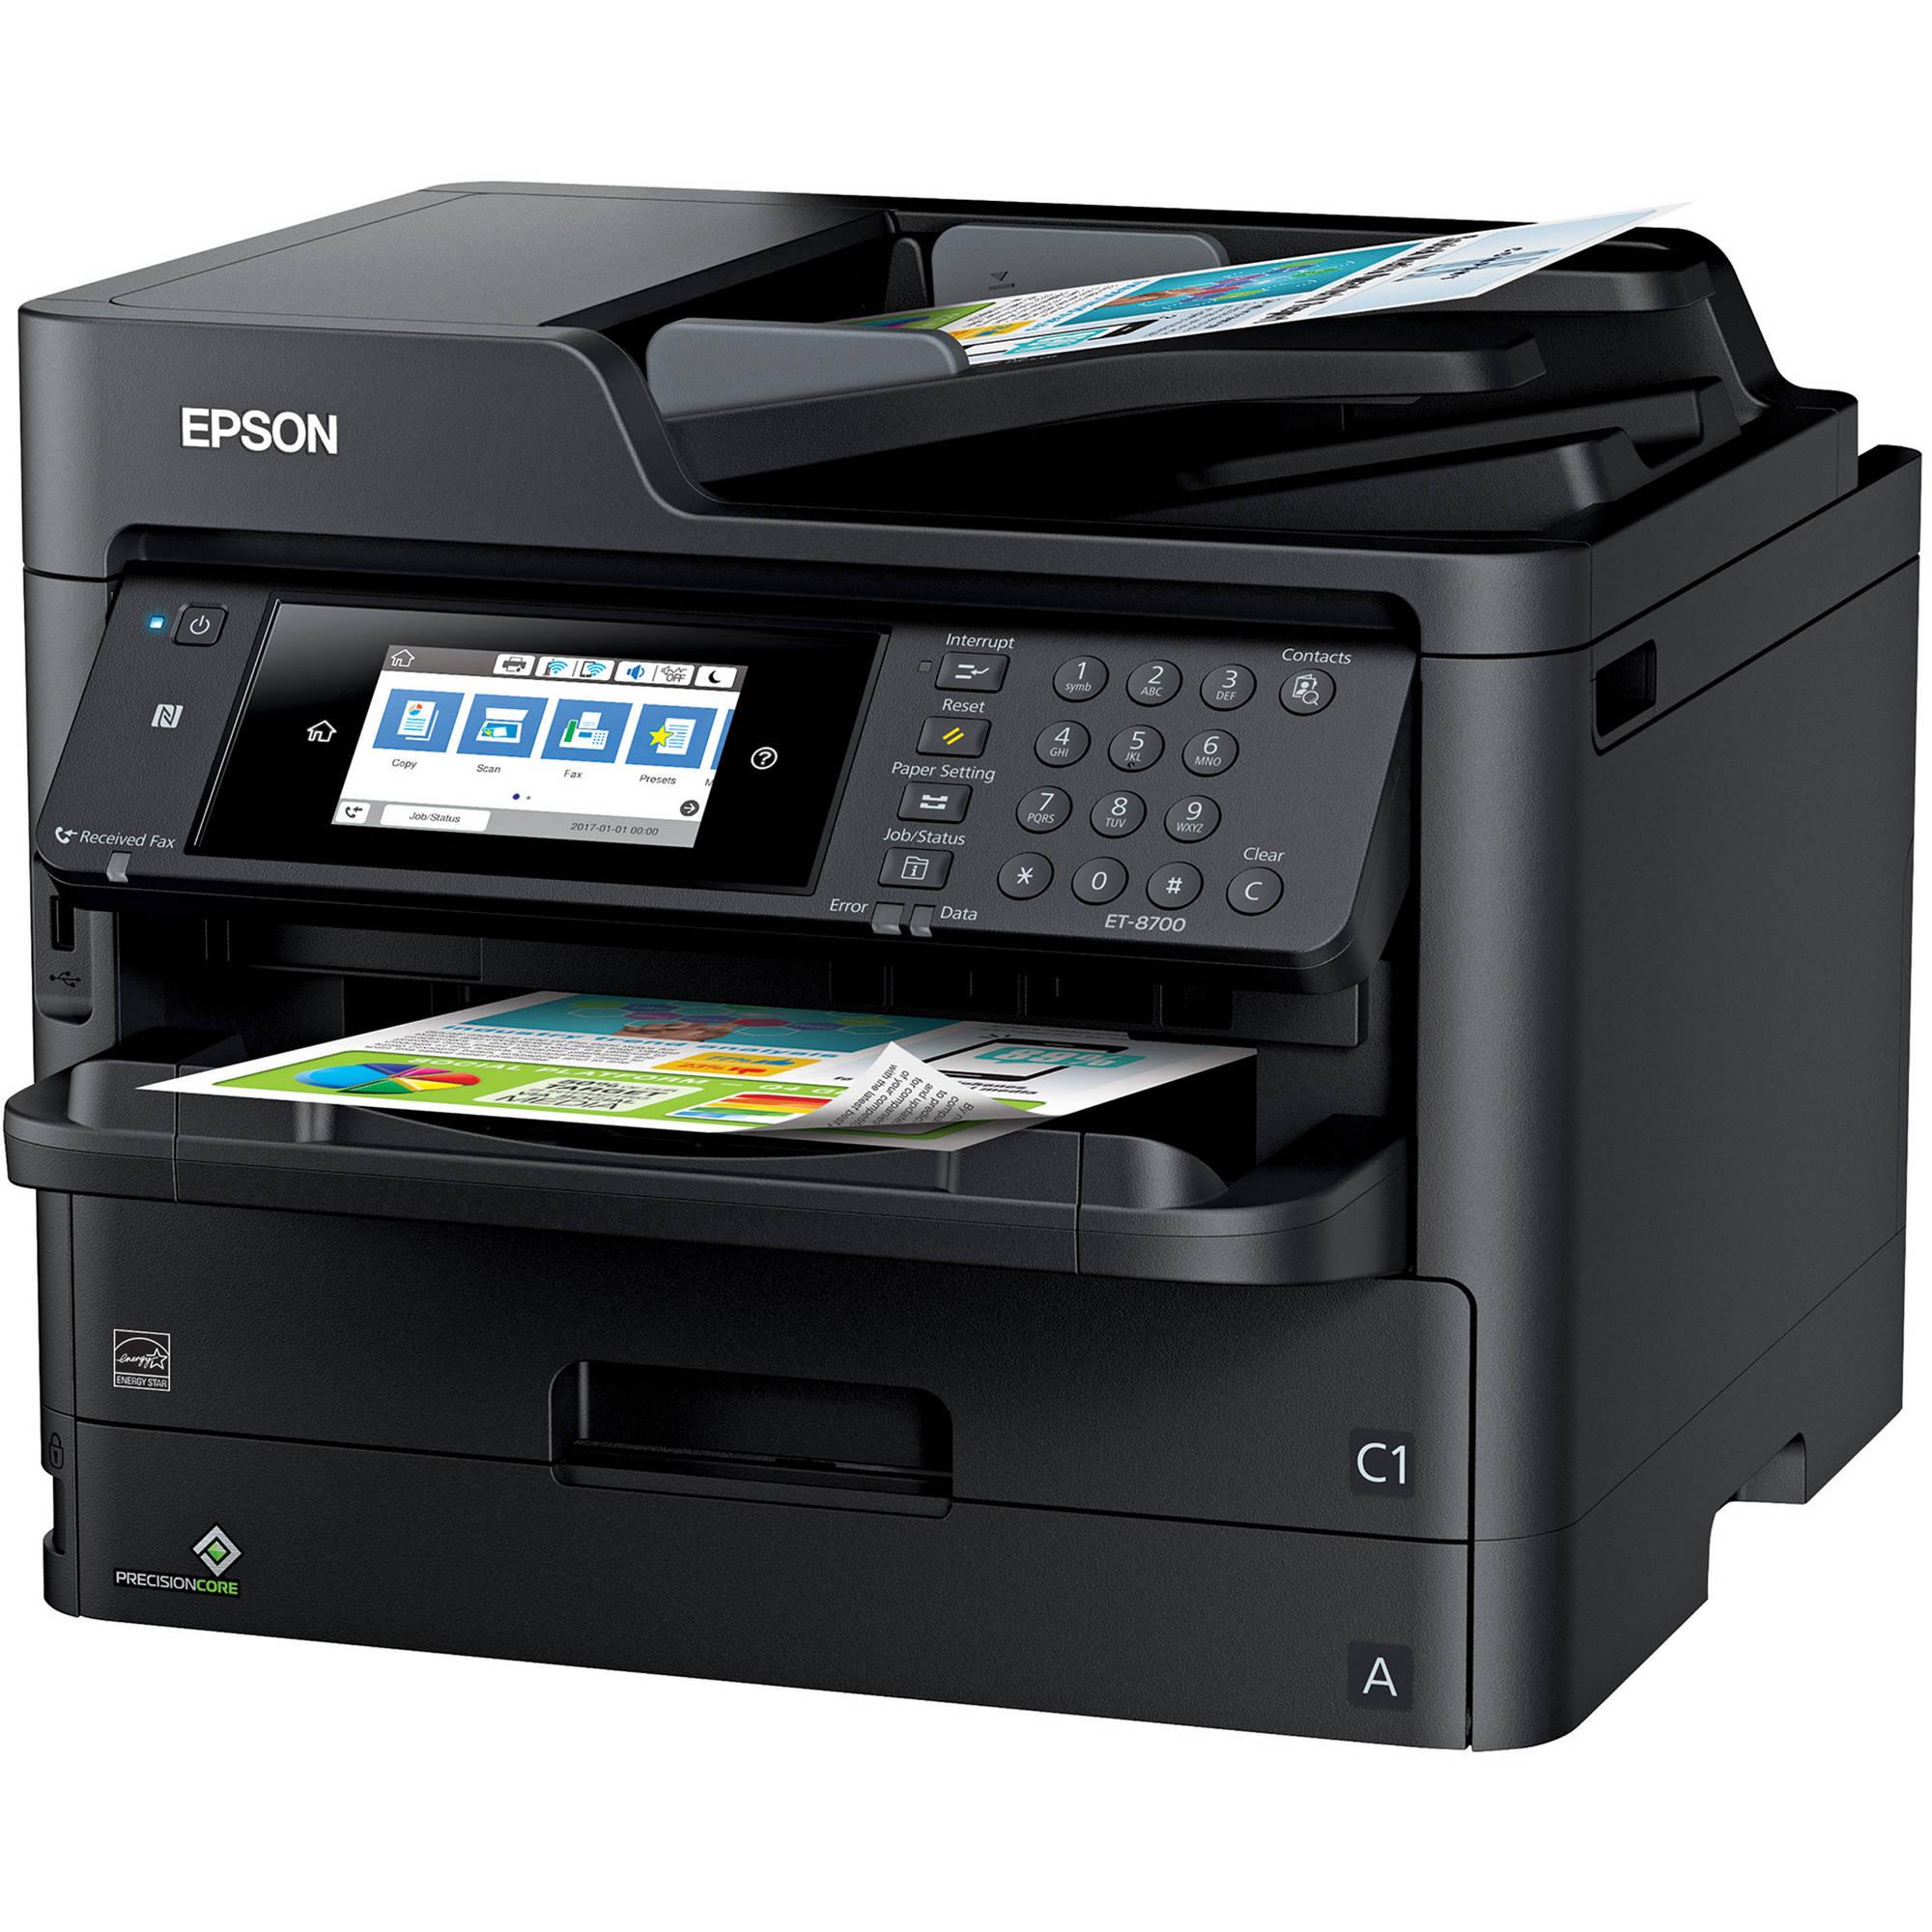 Epson WorkForce Pro ET-8700 EcoTank All-in-One Inkjet Printer